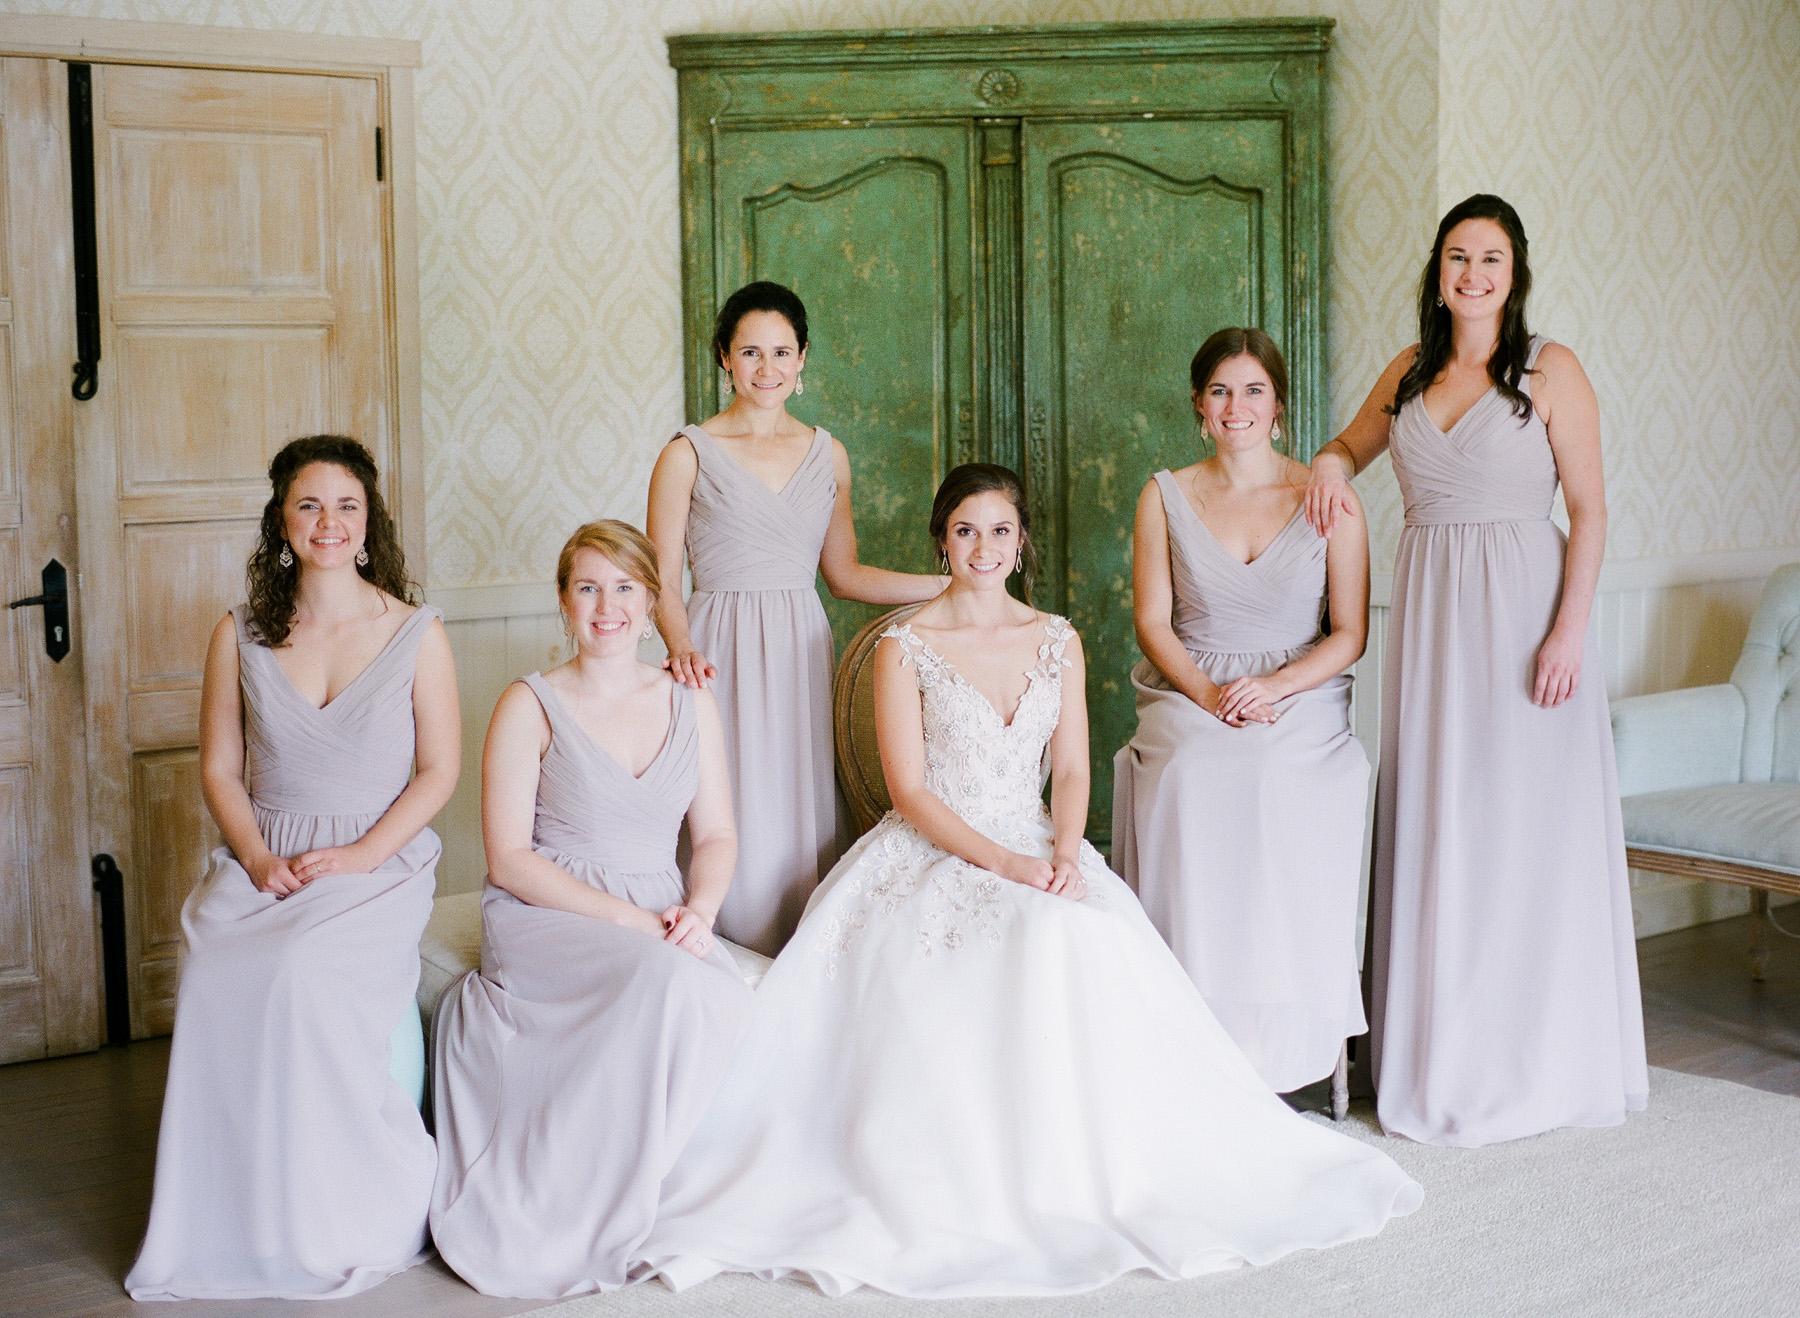 Pippin-Hill-Farm-and-Vinyards-Wedding-Film-Photography-08.jpg